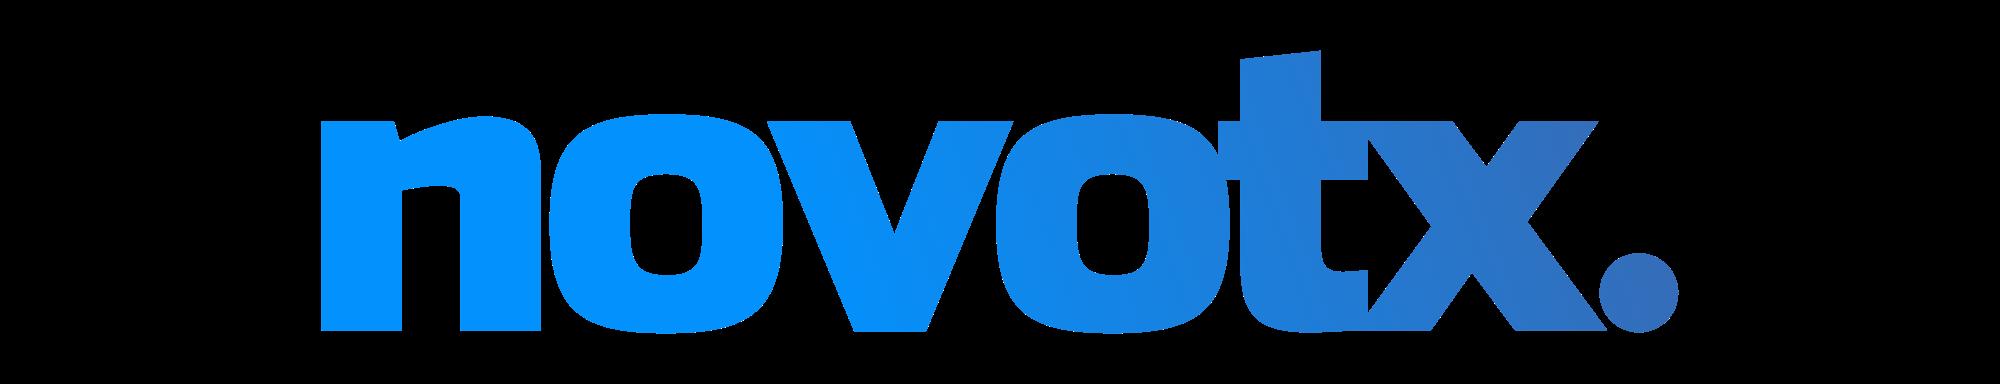 NVTX_novotx-logo.png